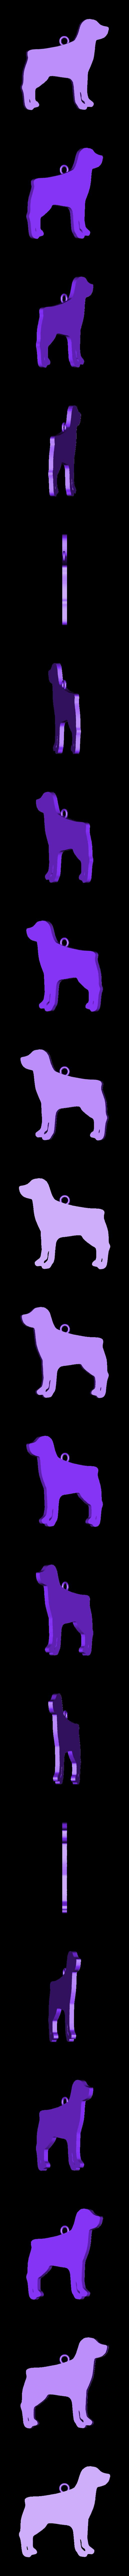 38.stl Download STL file Dogs • 3D printing object, GENNADI3313